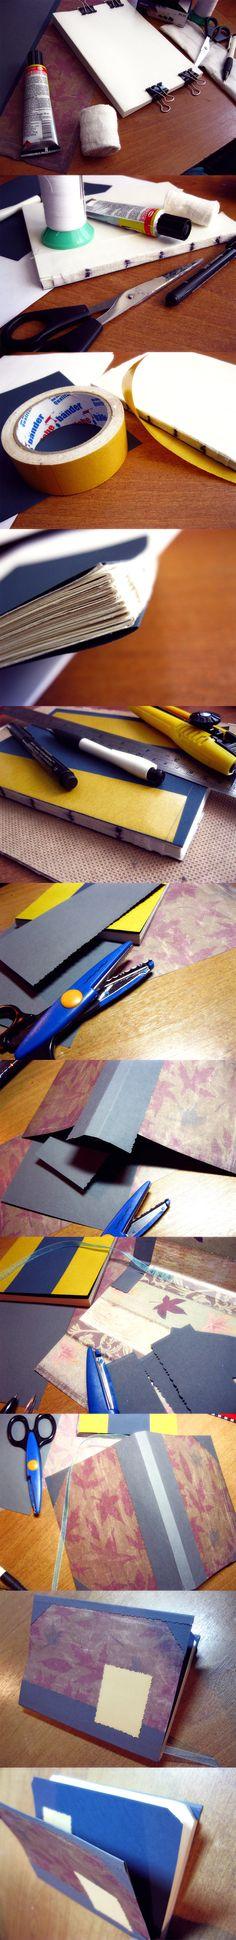 How to make sketchbook. Steps by Piromanova.deviantart.com